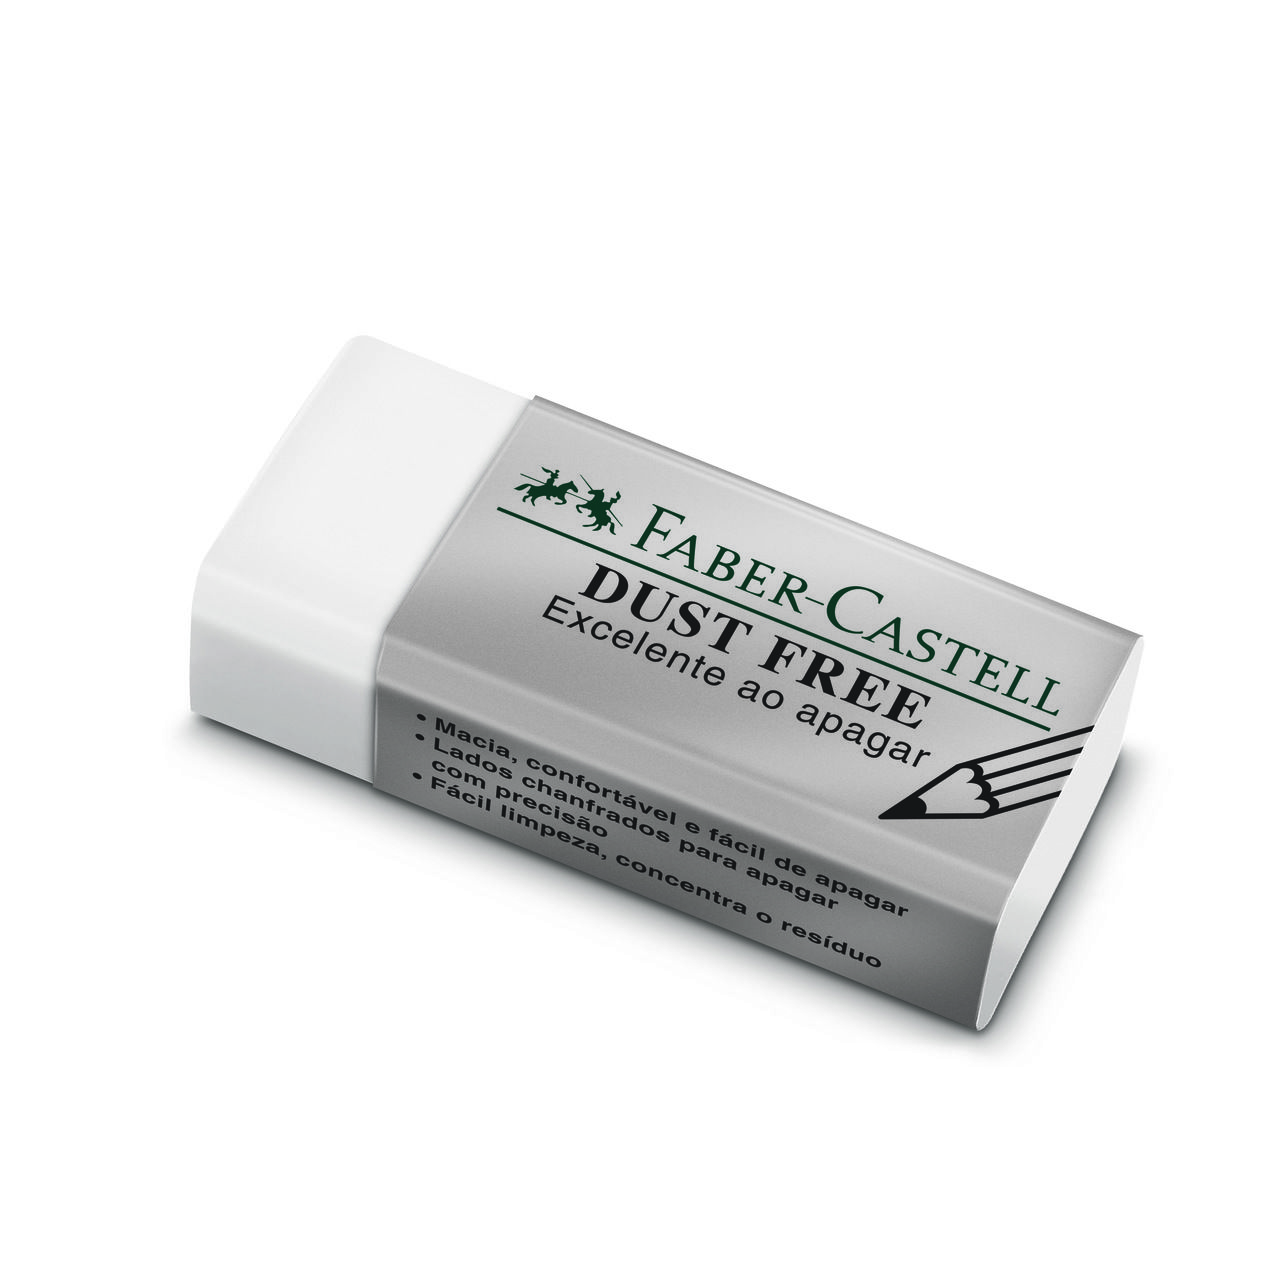 Borracha branca pequena DUST FREE Faber-Castell